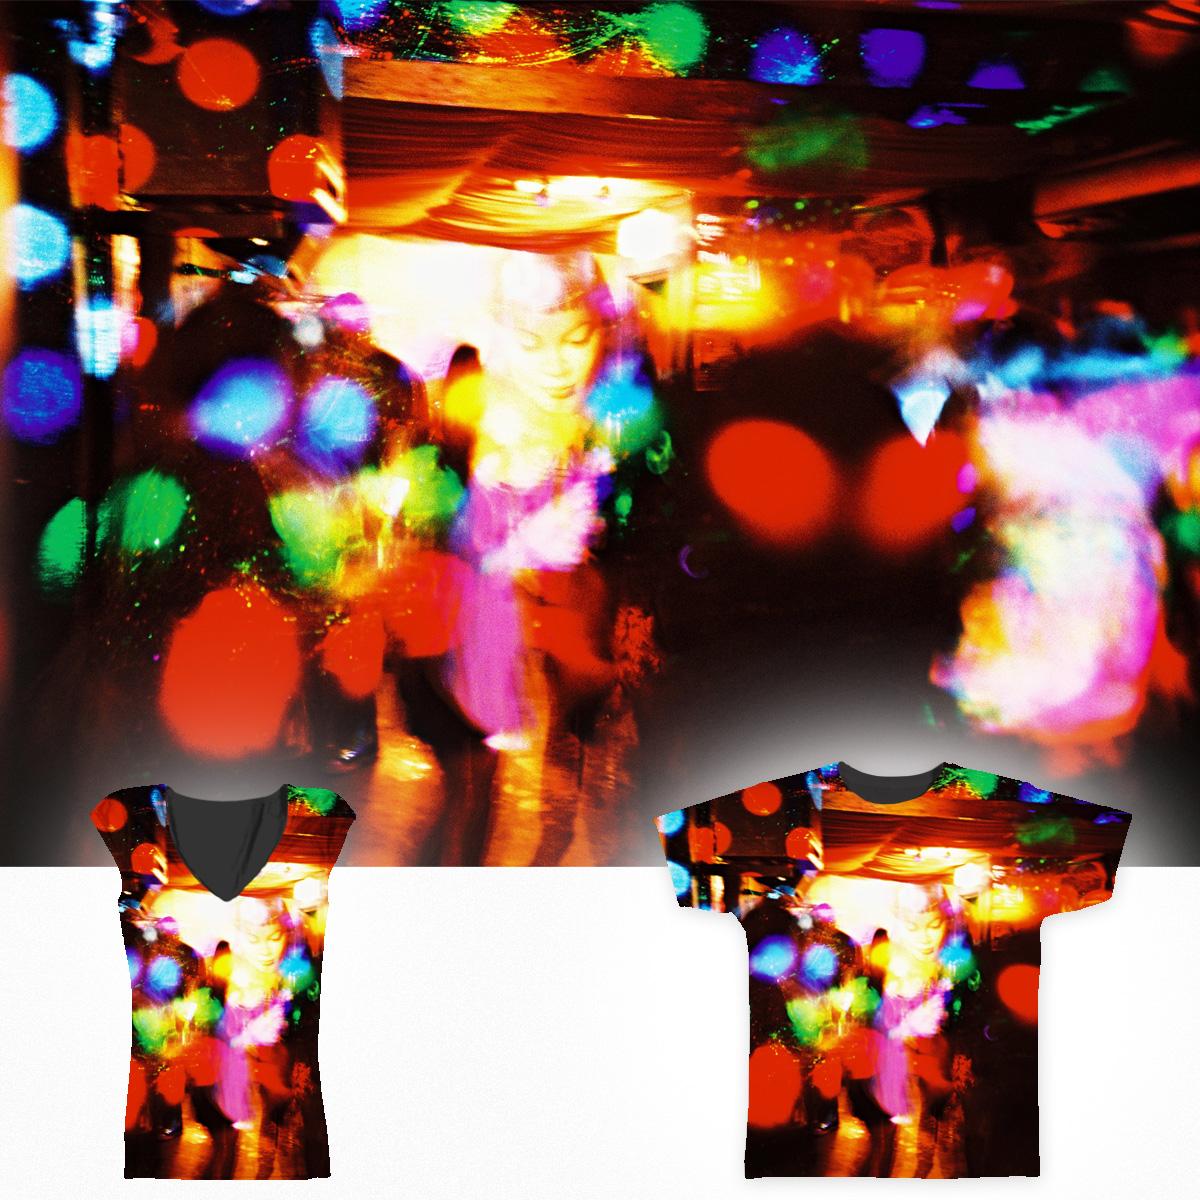 Dance Floor by UpstartThunder on Threadless